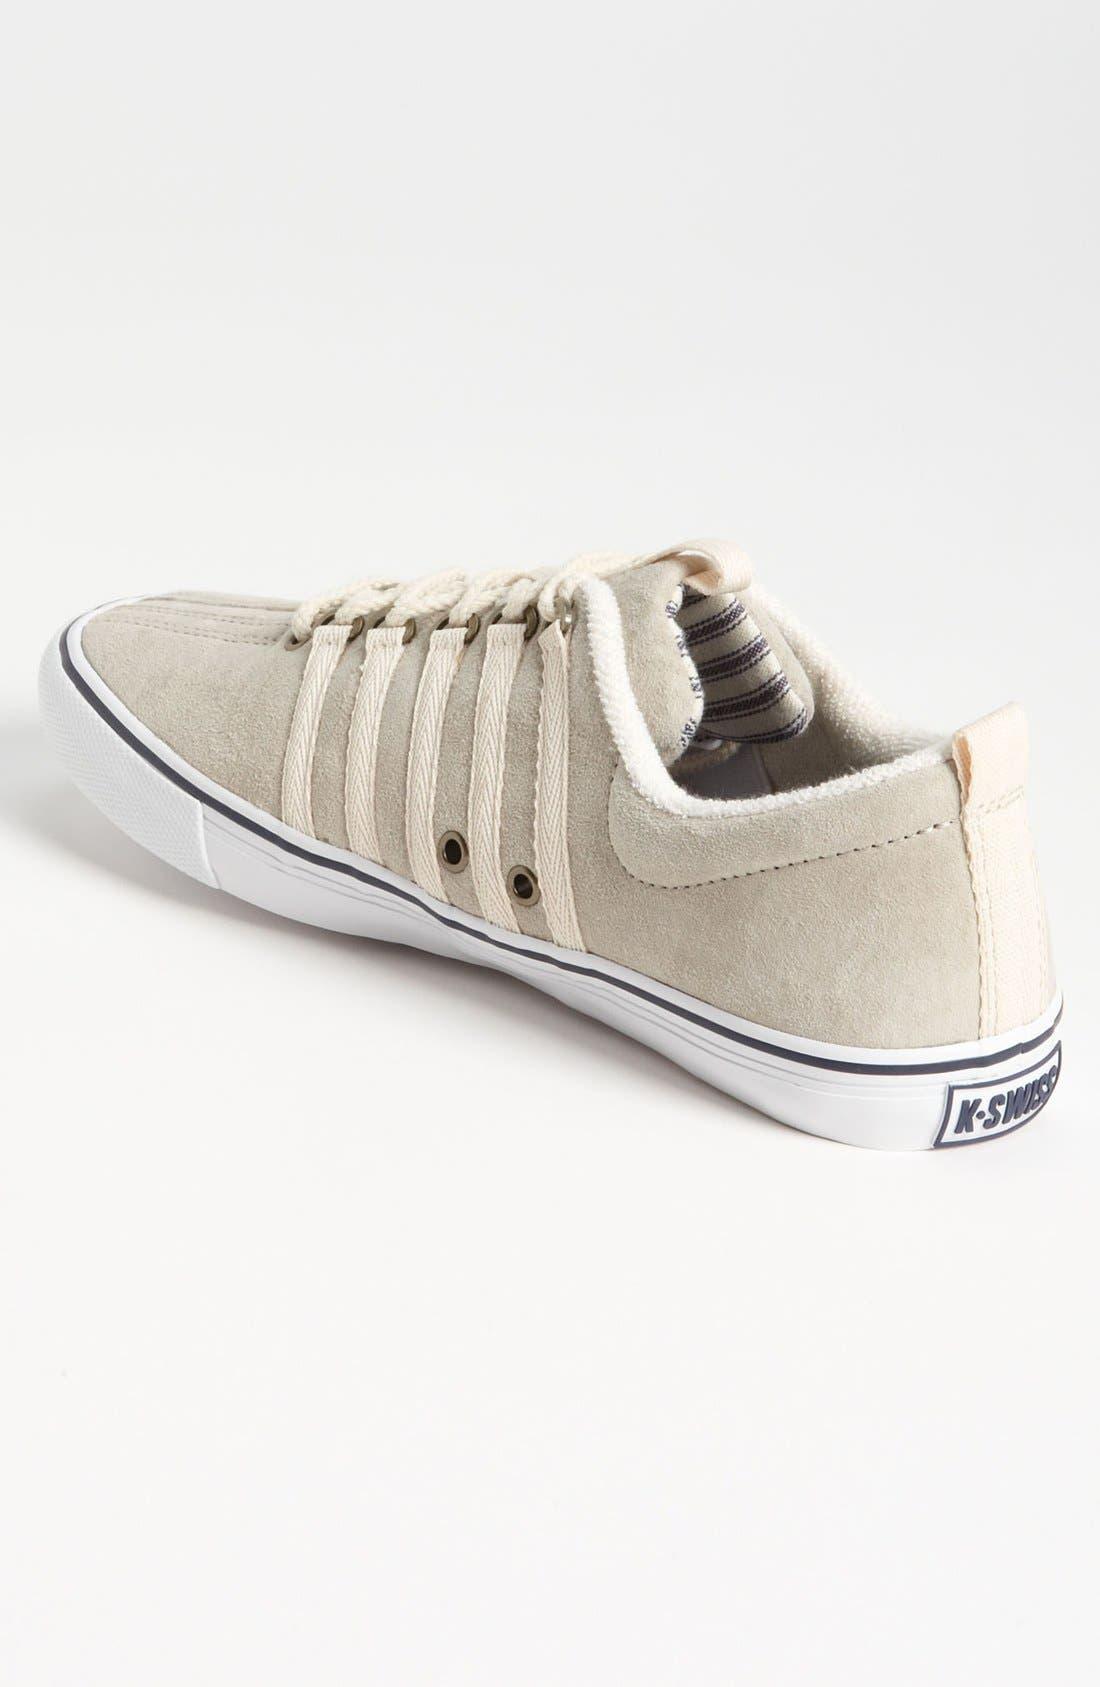 'Billy Reid Venice' Suede Sneaker,                             Alternate thumbnail 4, color,                             052